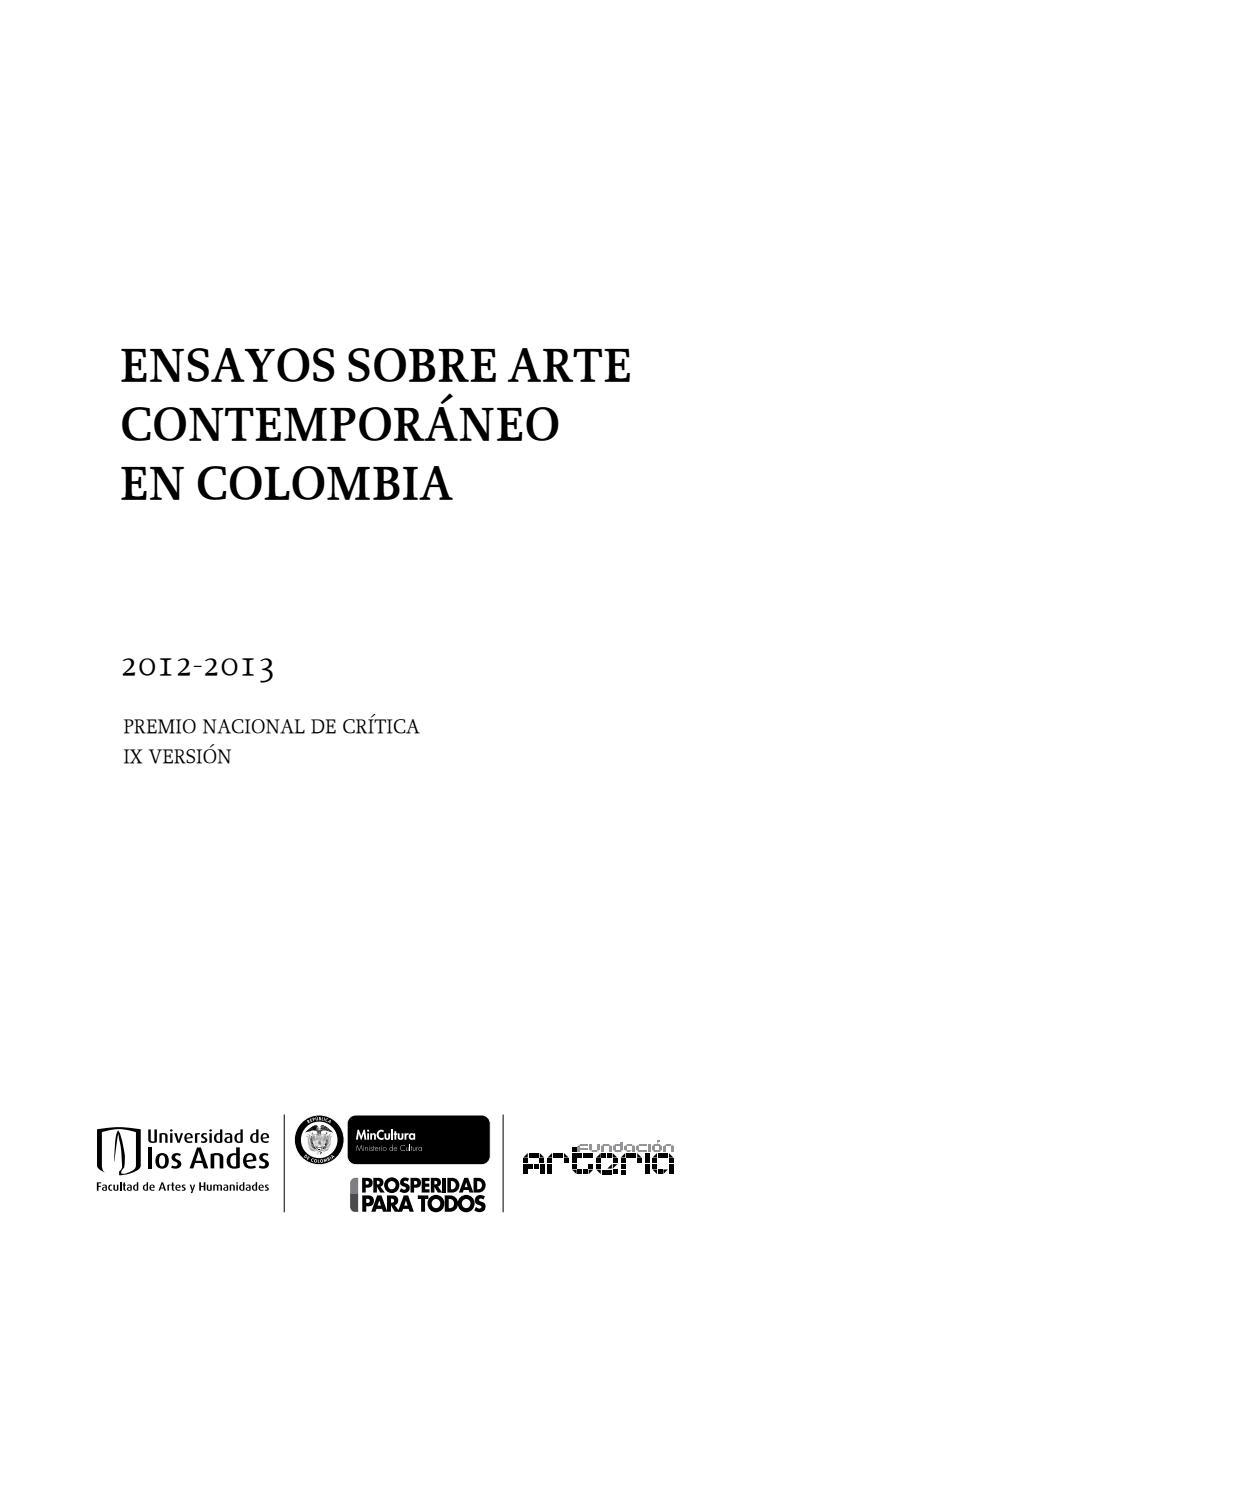 Premio Nacional de Crítica # 9 by Artes Visuales Mincultura - issuu